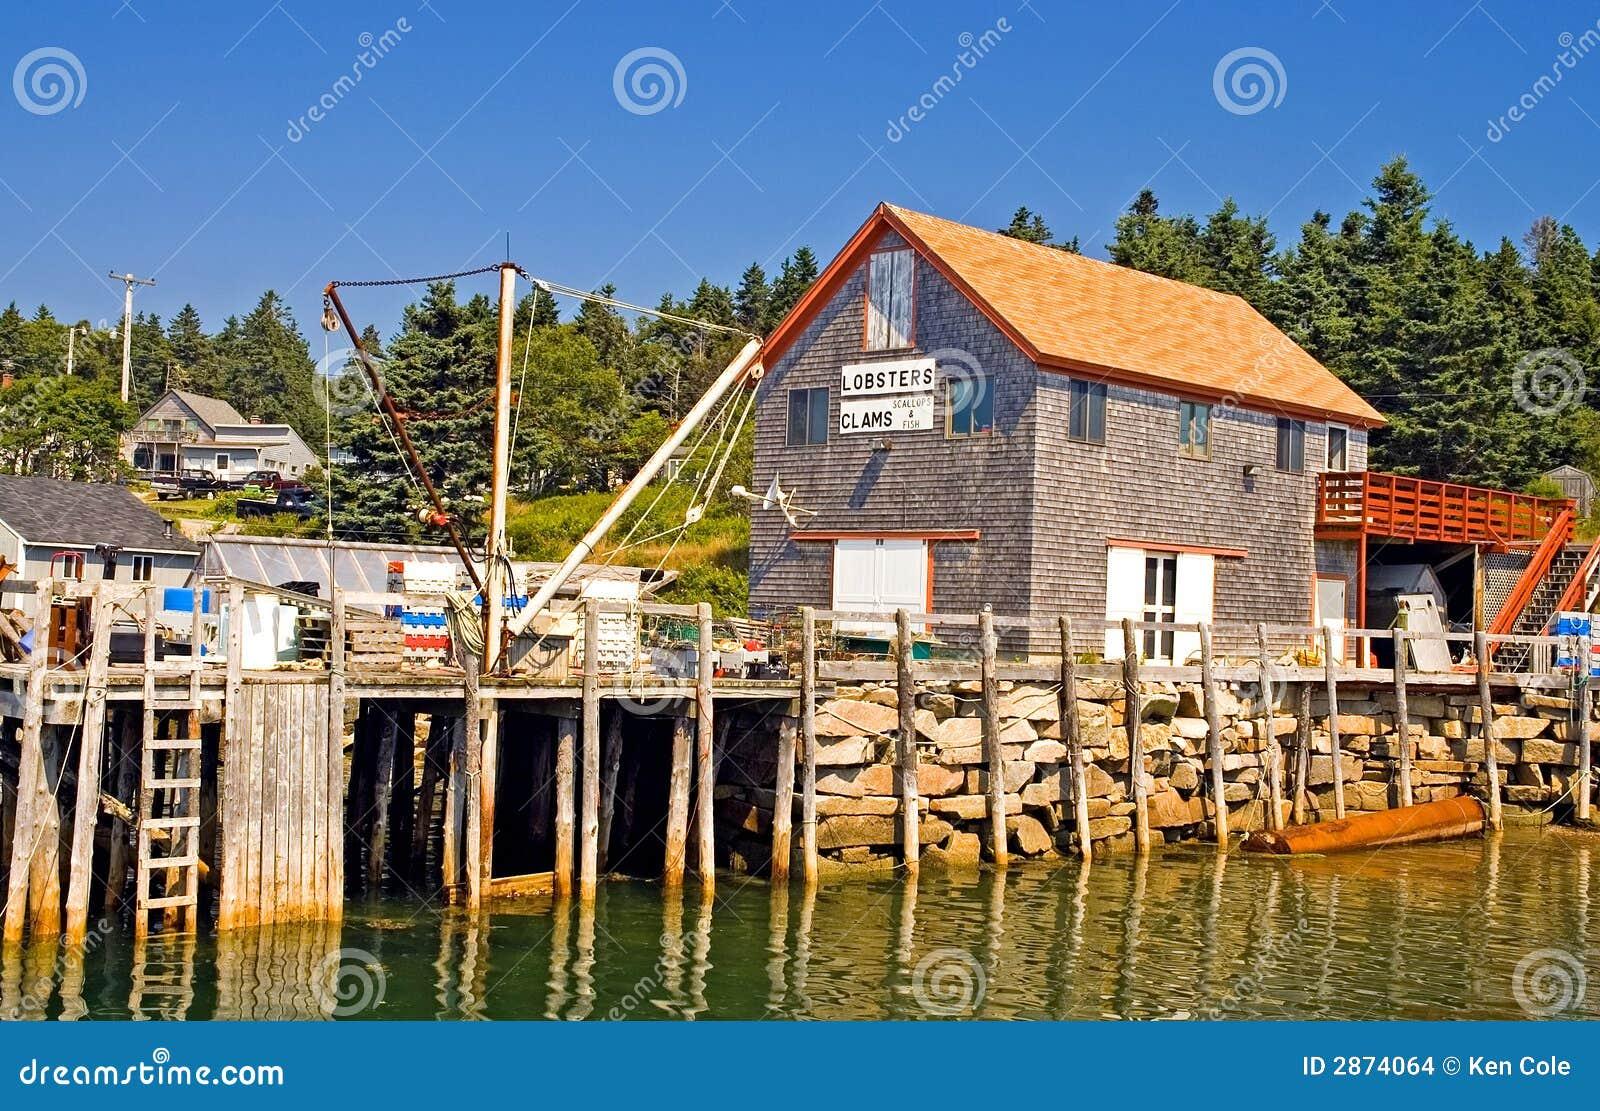 Maine Fishing Wharf Stock Images - Image: 2874064